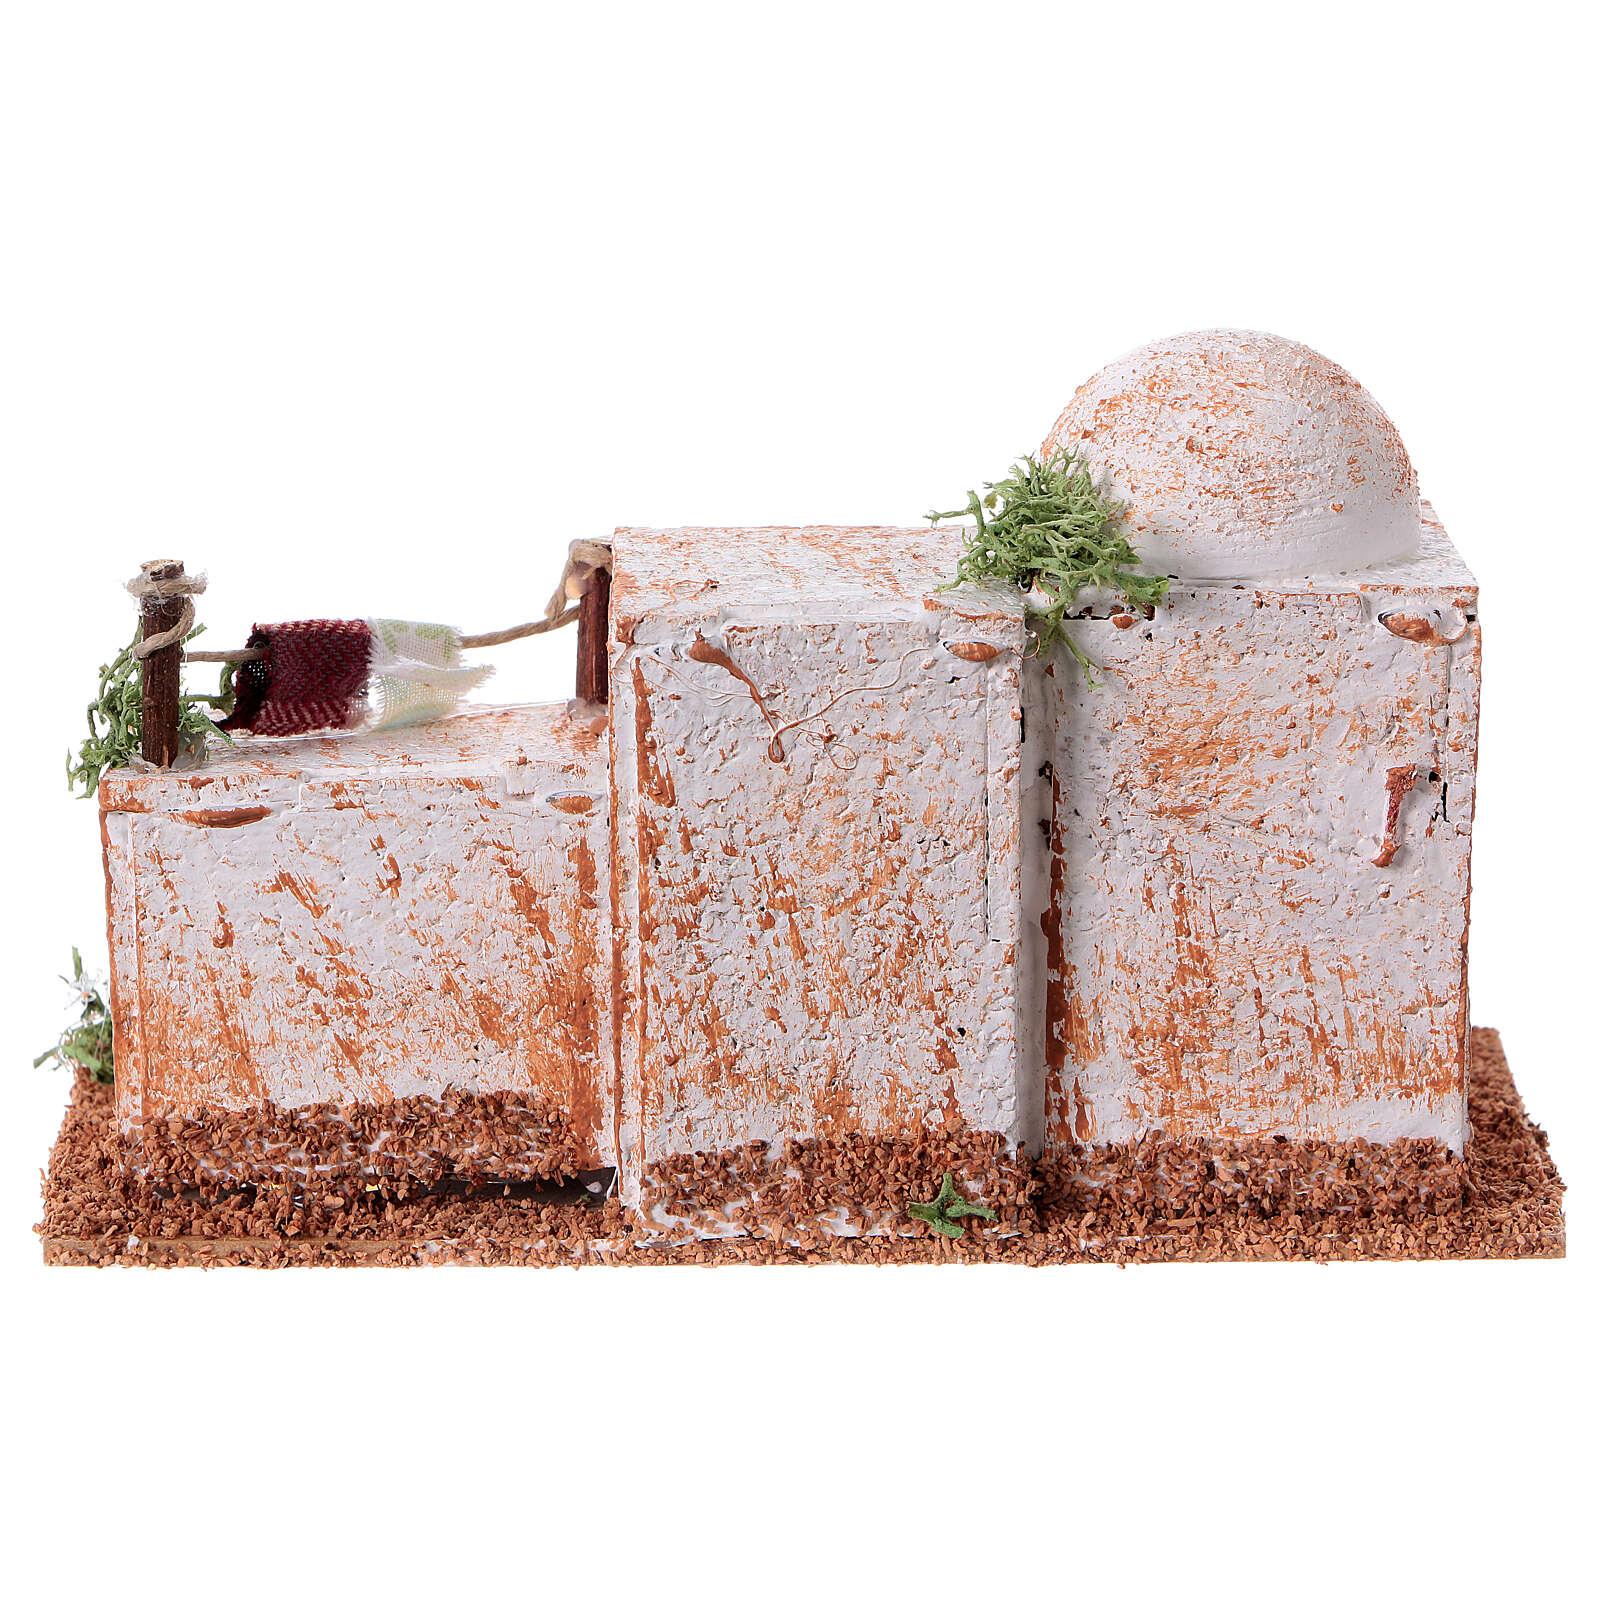 Casa árabe cortiça 15x7xh 8 cm 4